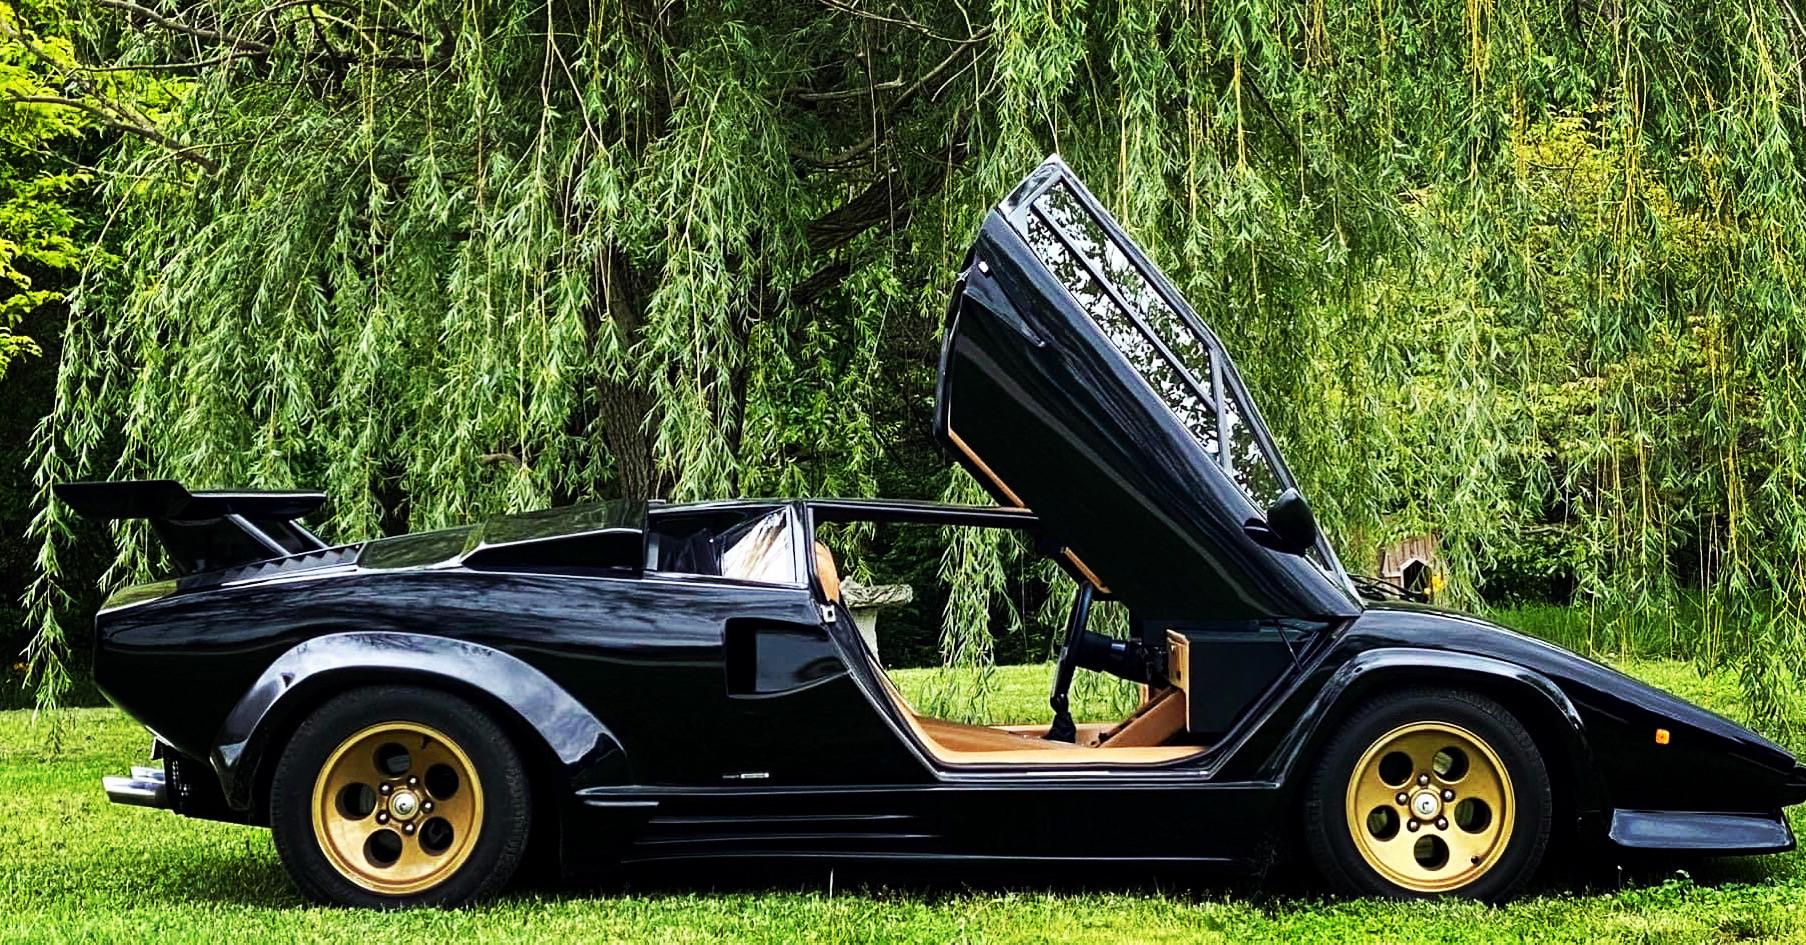 Lamborghini Countach Hire Arlington